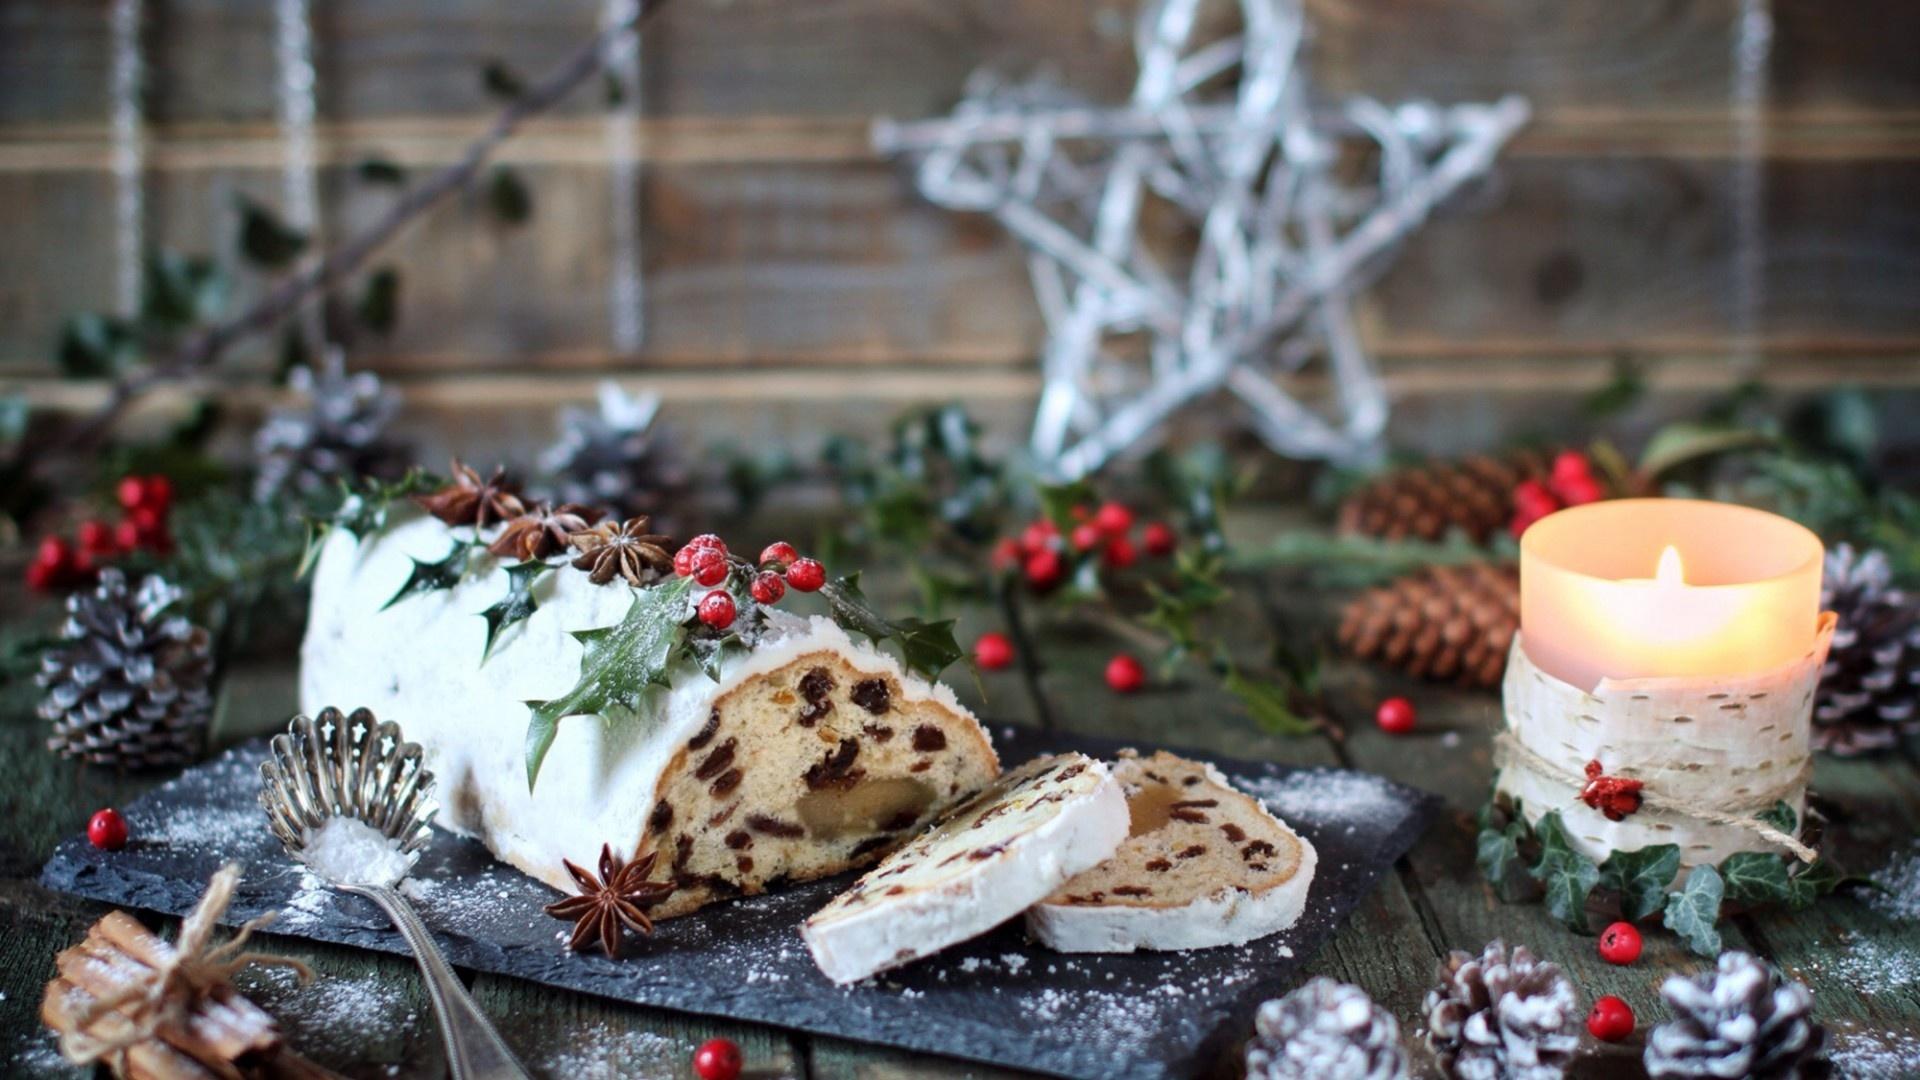 Christmas Dishes Desktop Wallpaper